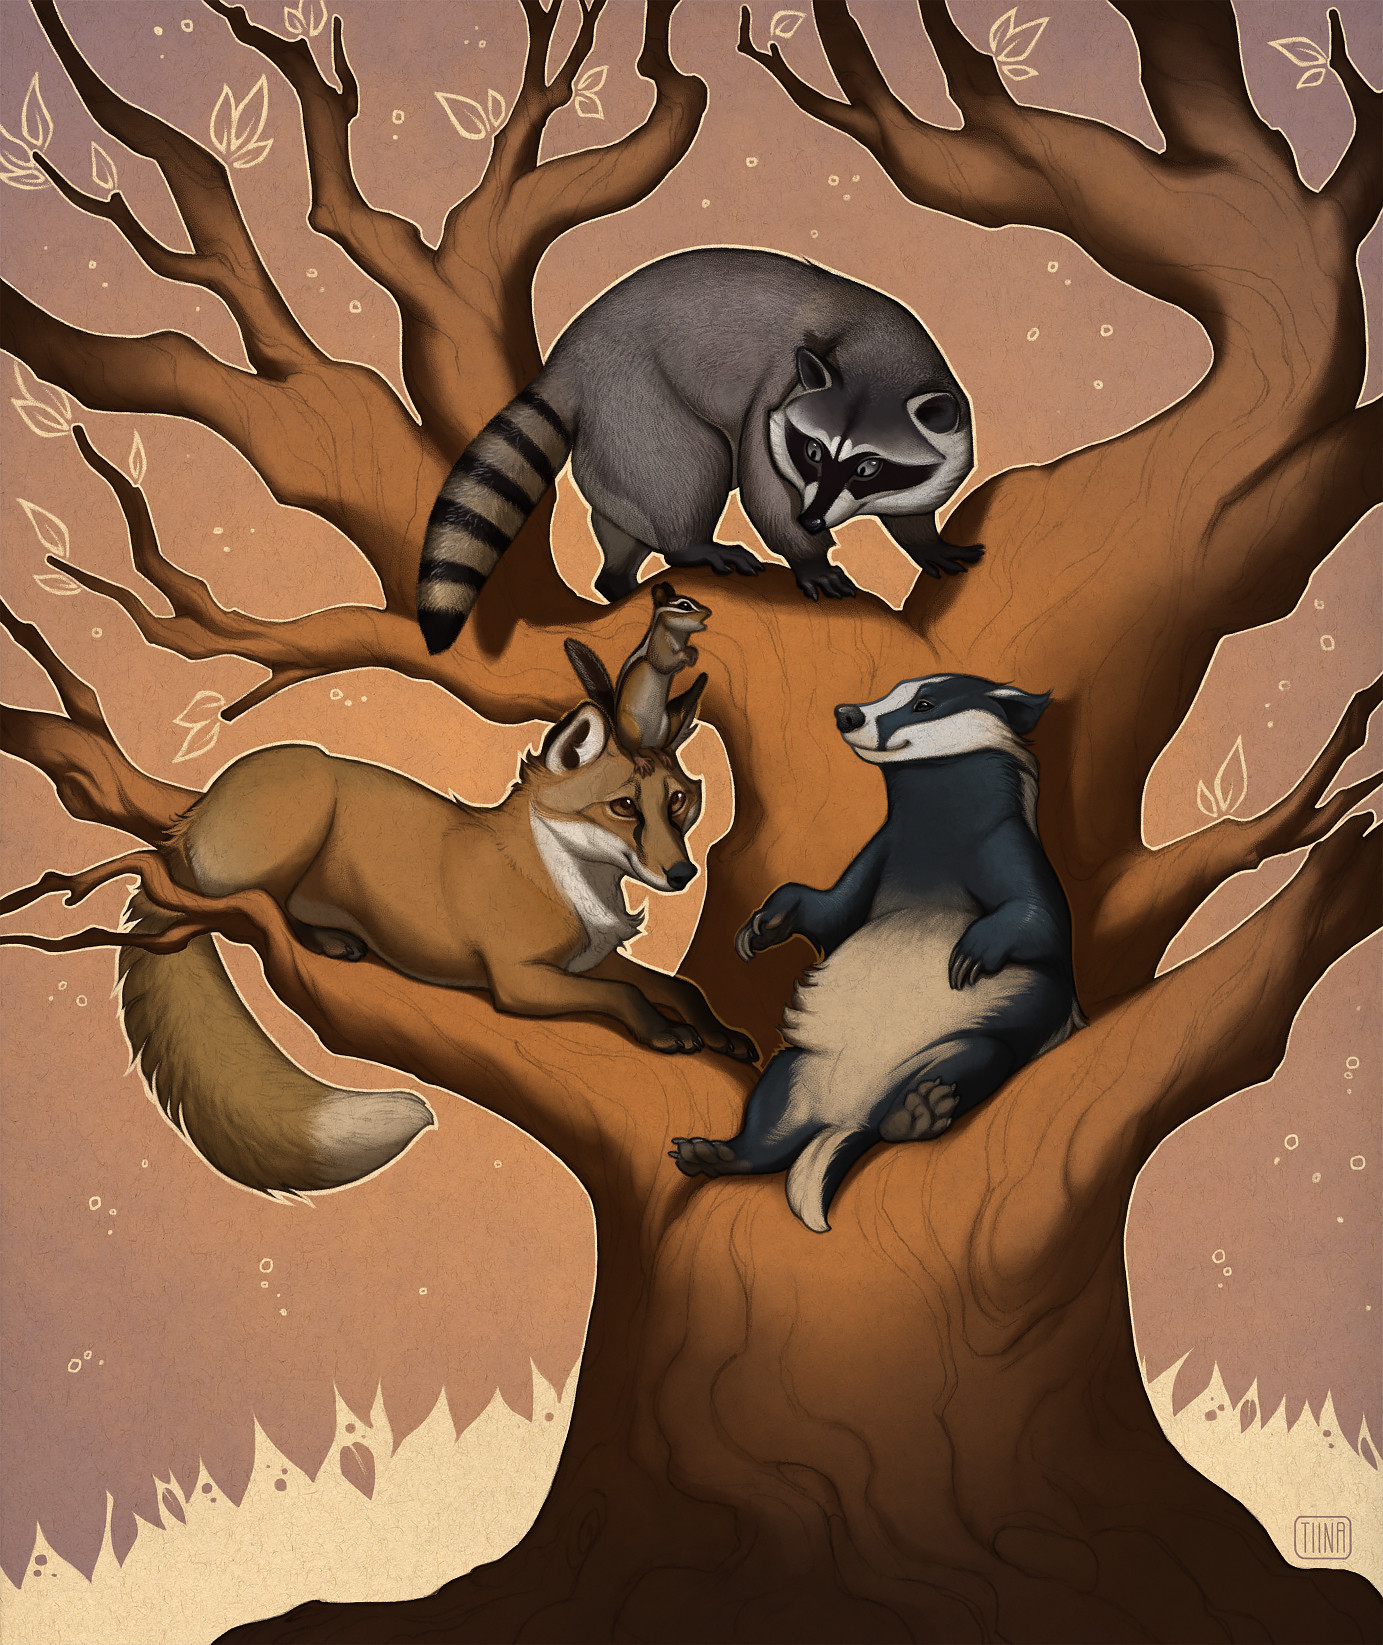 Finished Illustration painted digitally